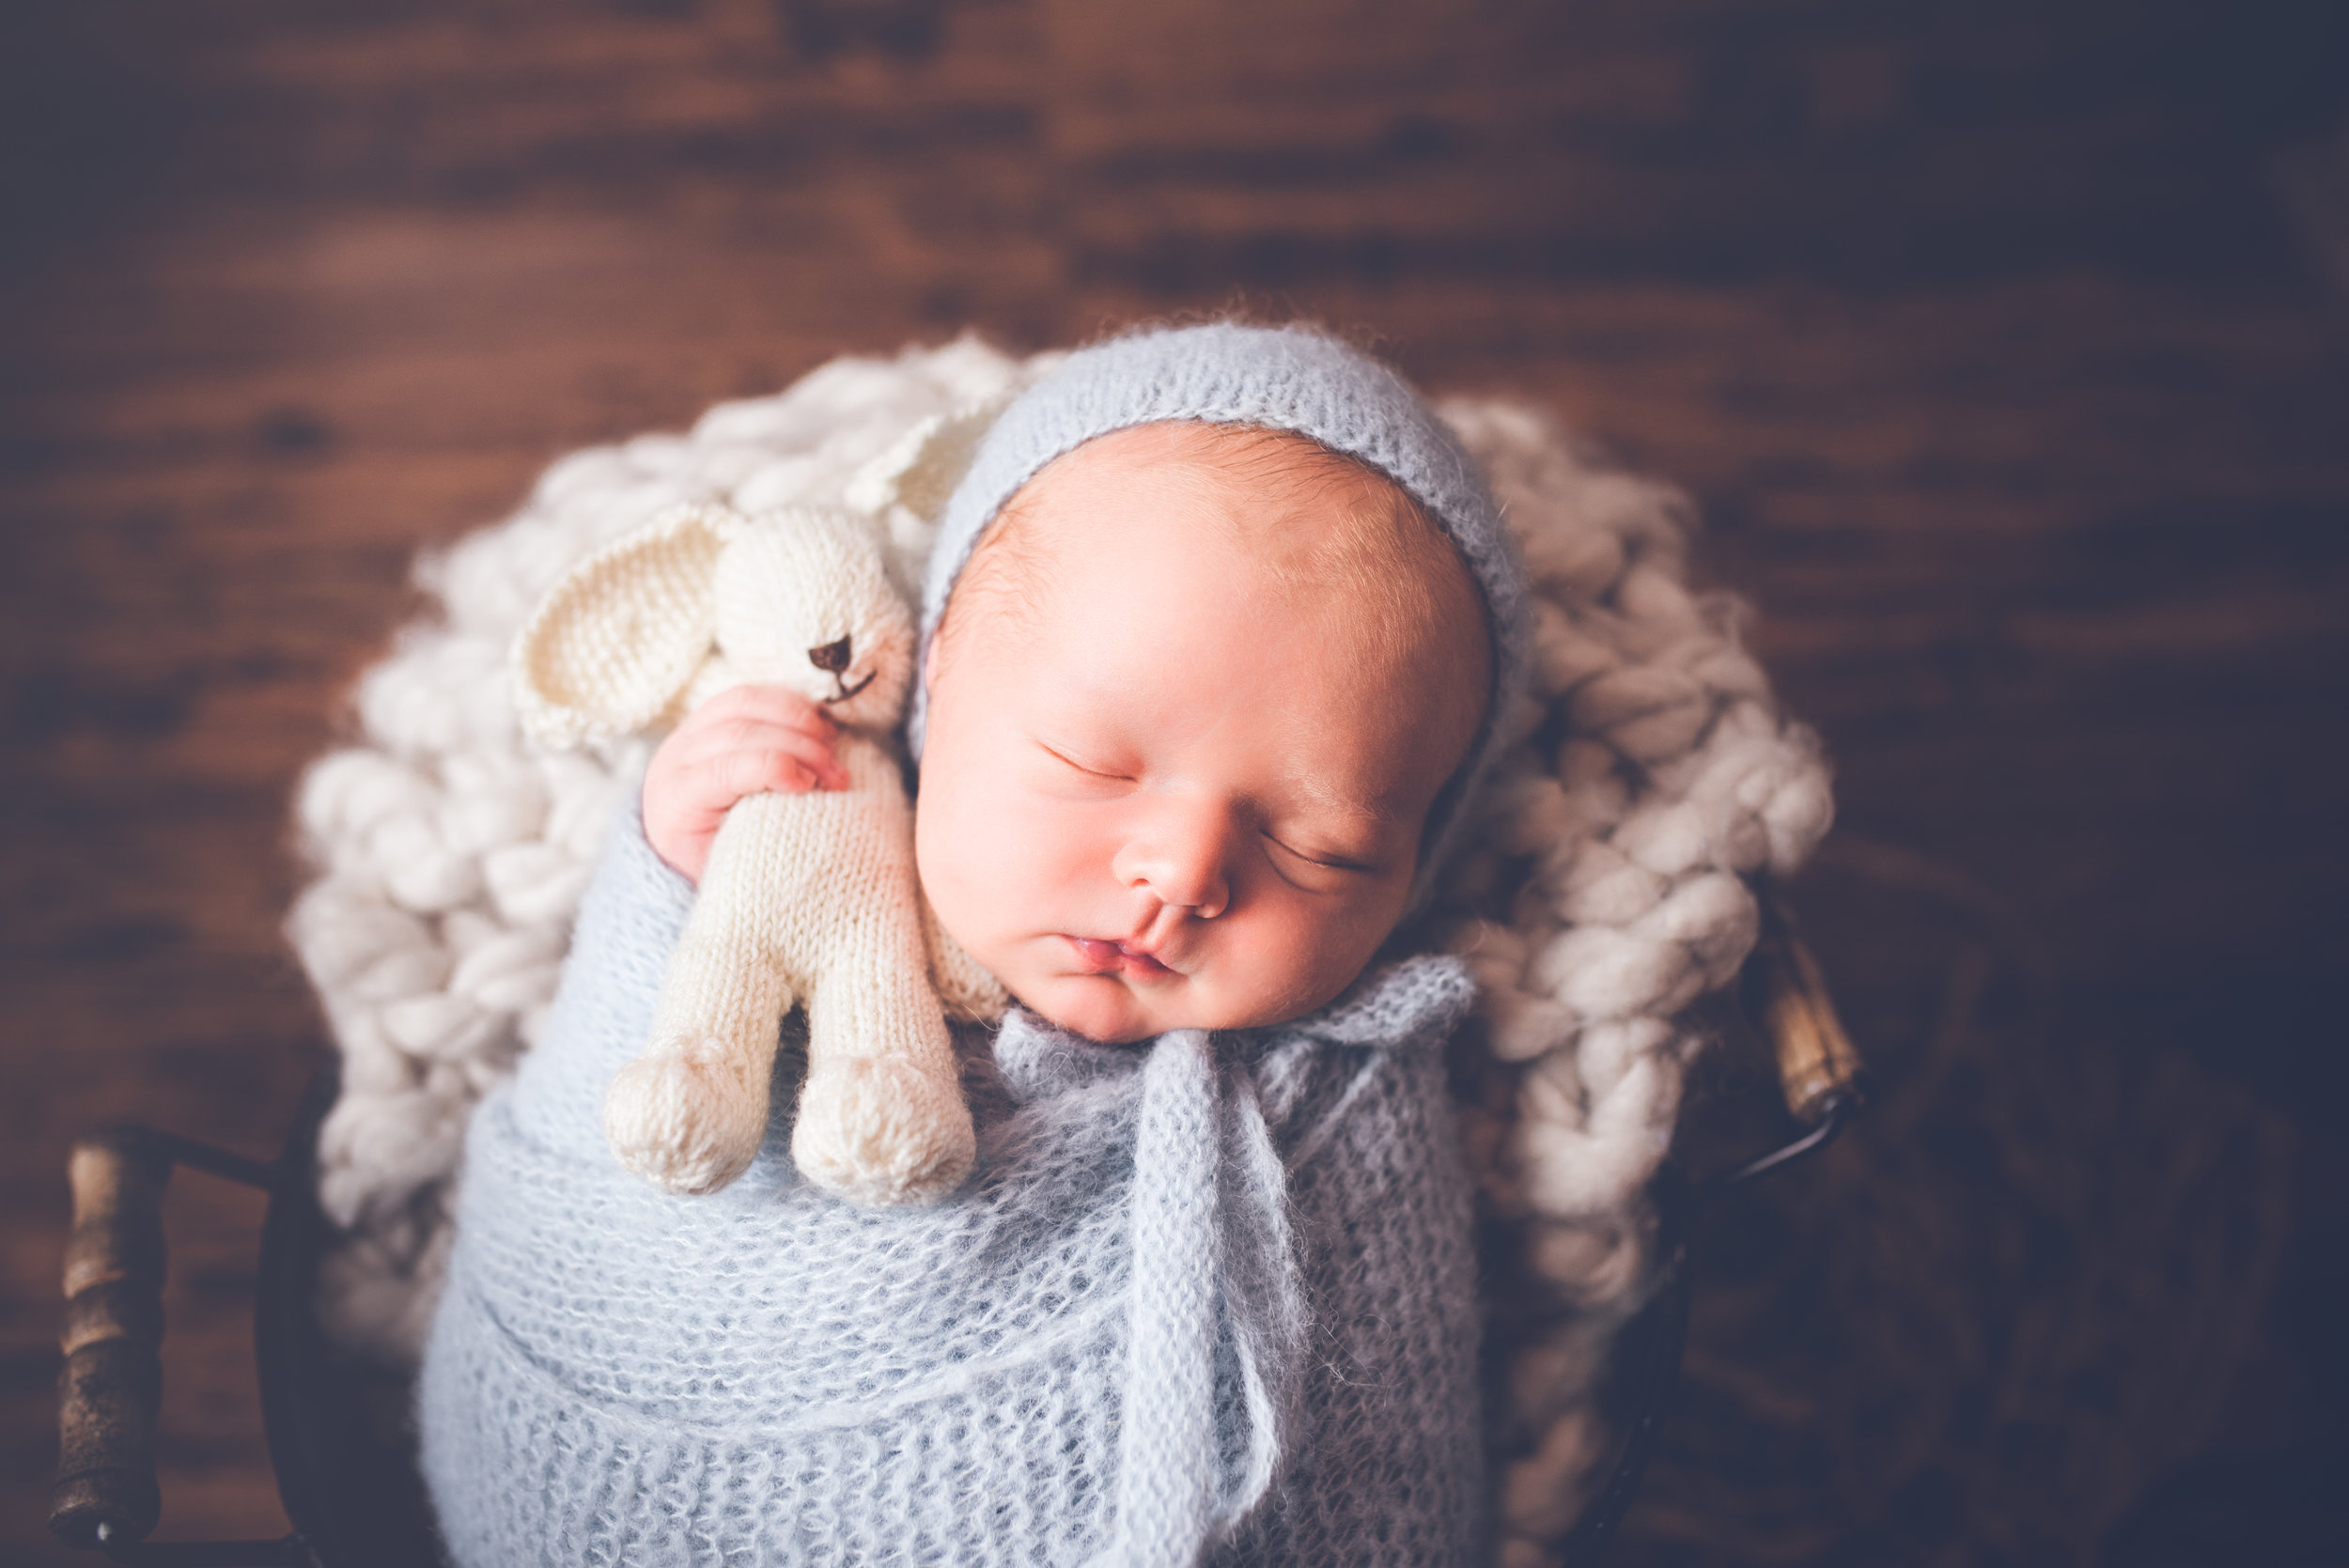 Newborn_Liam_11Days-1.jpg